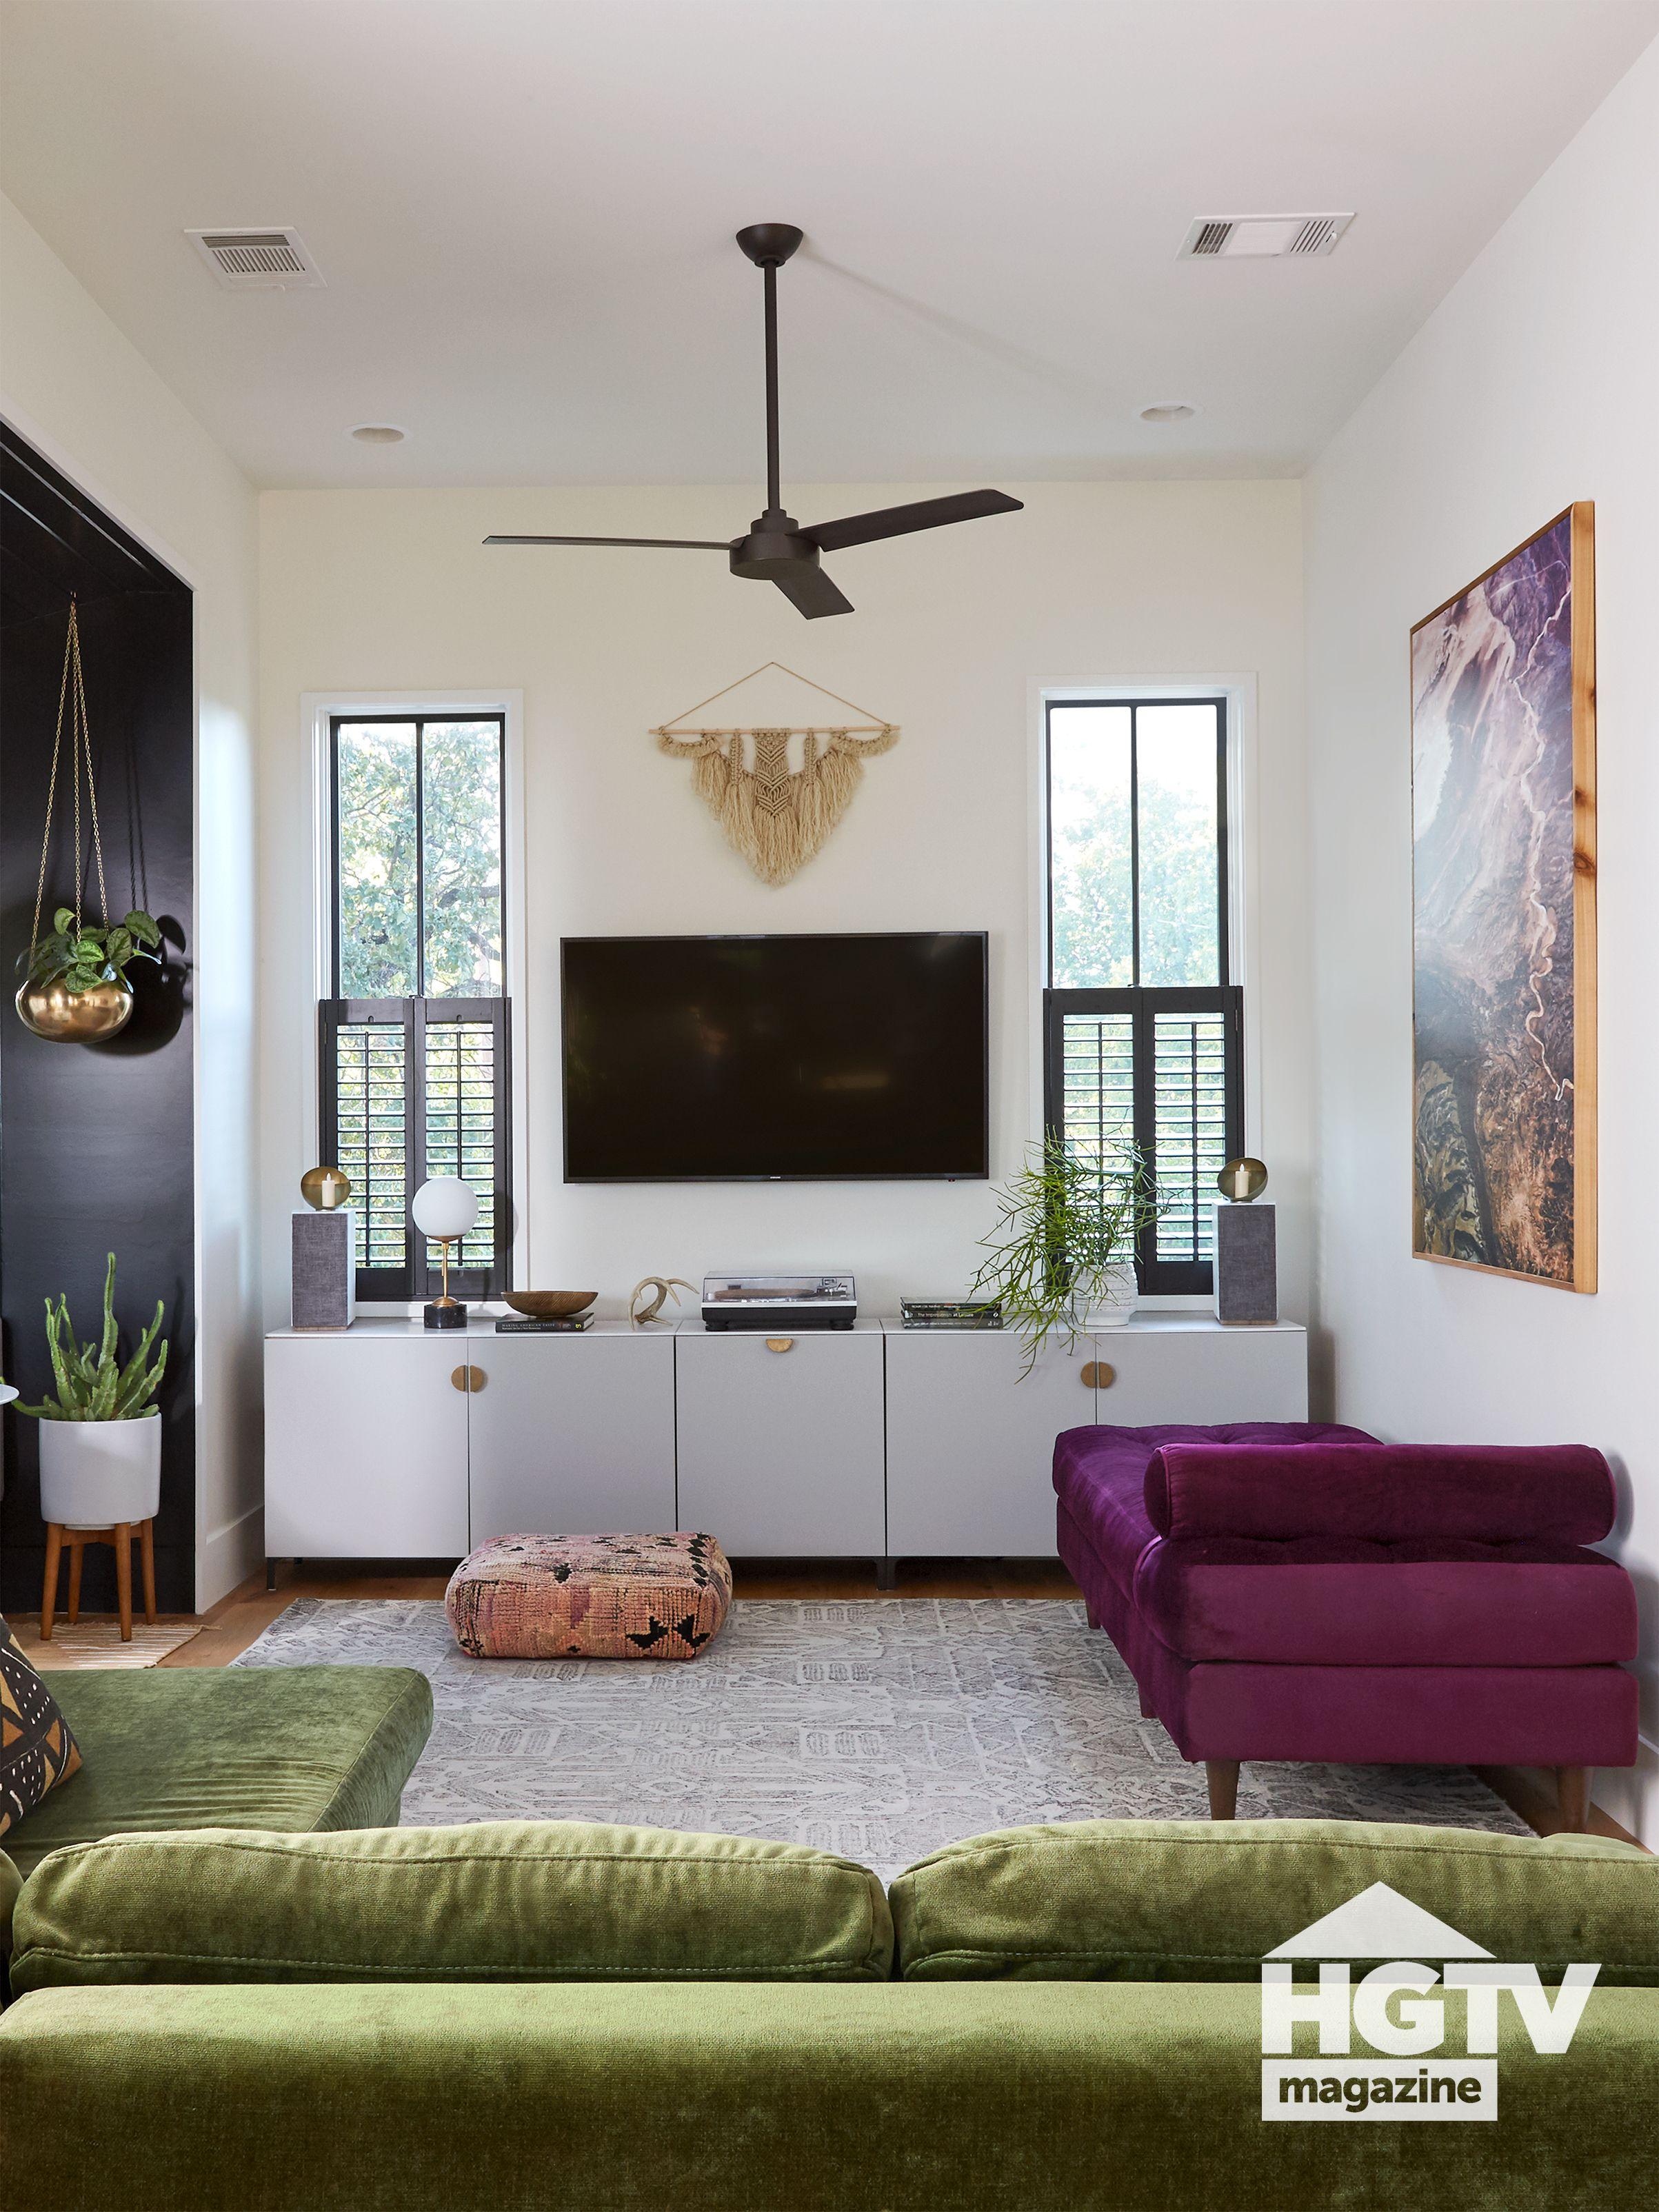 A Boho Style Living Room From Hgtv Magazine In 2020 Boho Style Living Rooms Home Condo Living #space #saver #living #room